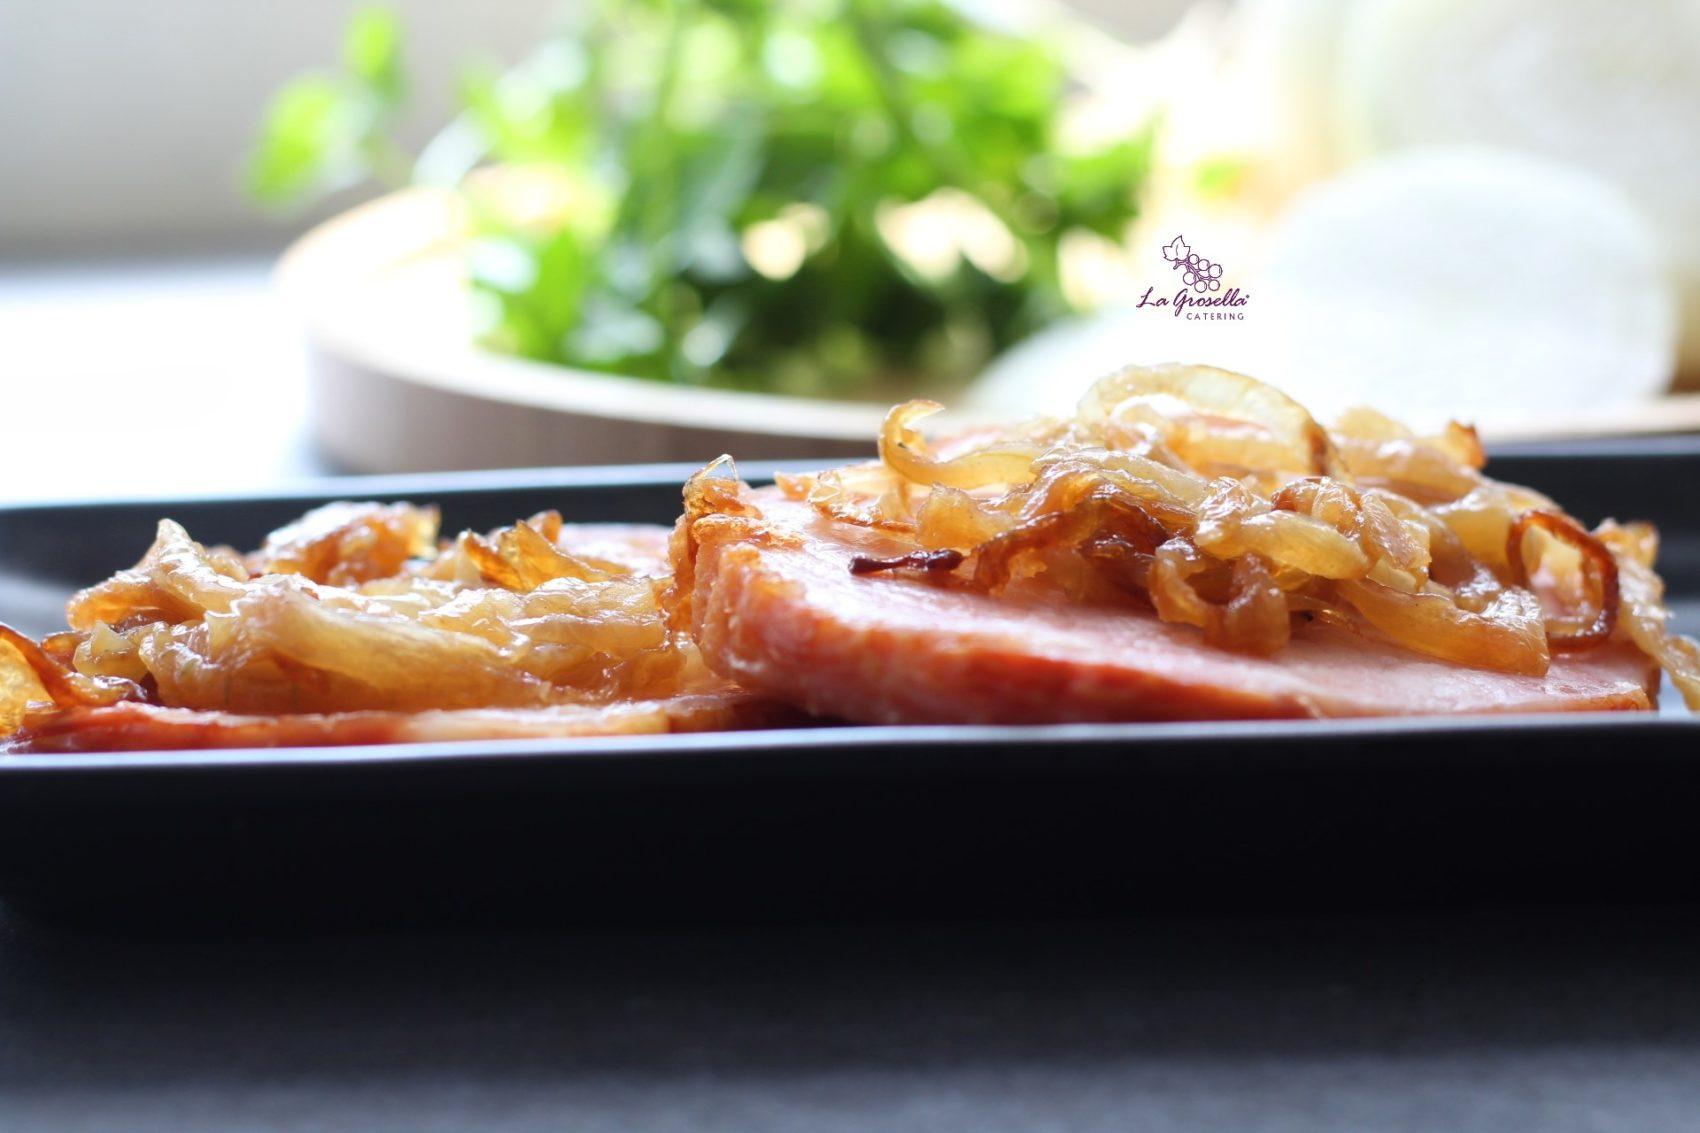 Lomo de Sajonia con cebolla  caramelizada